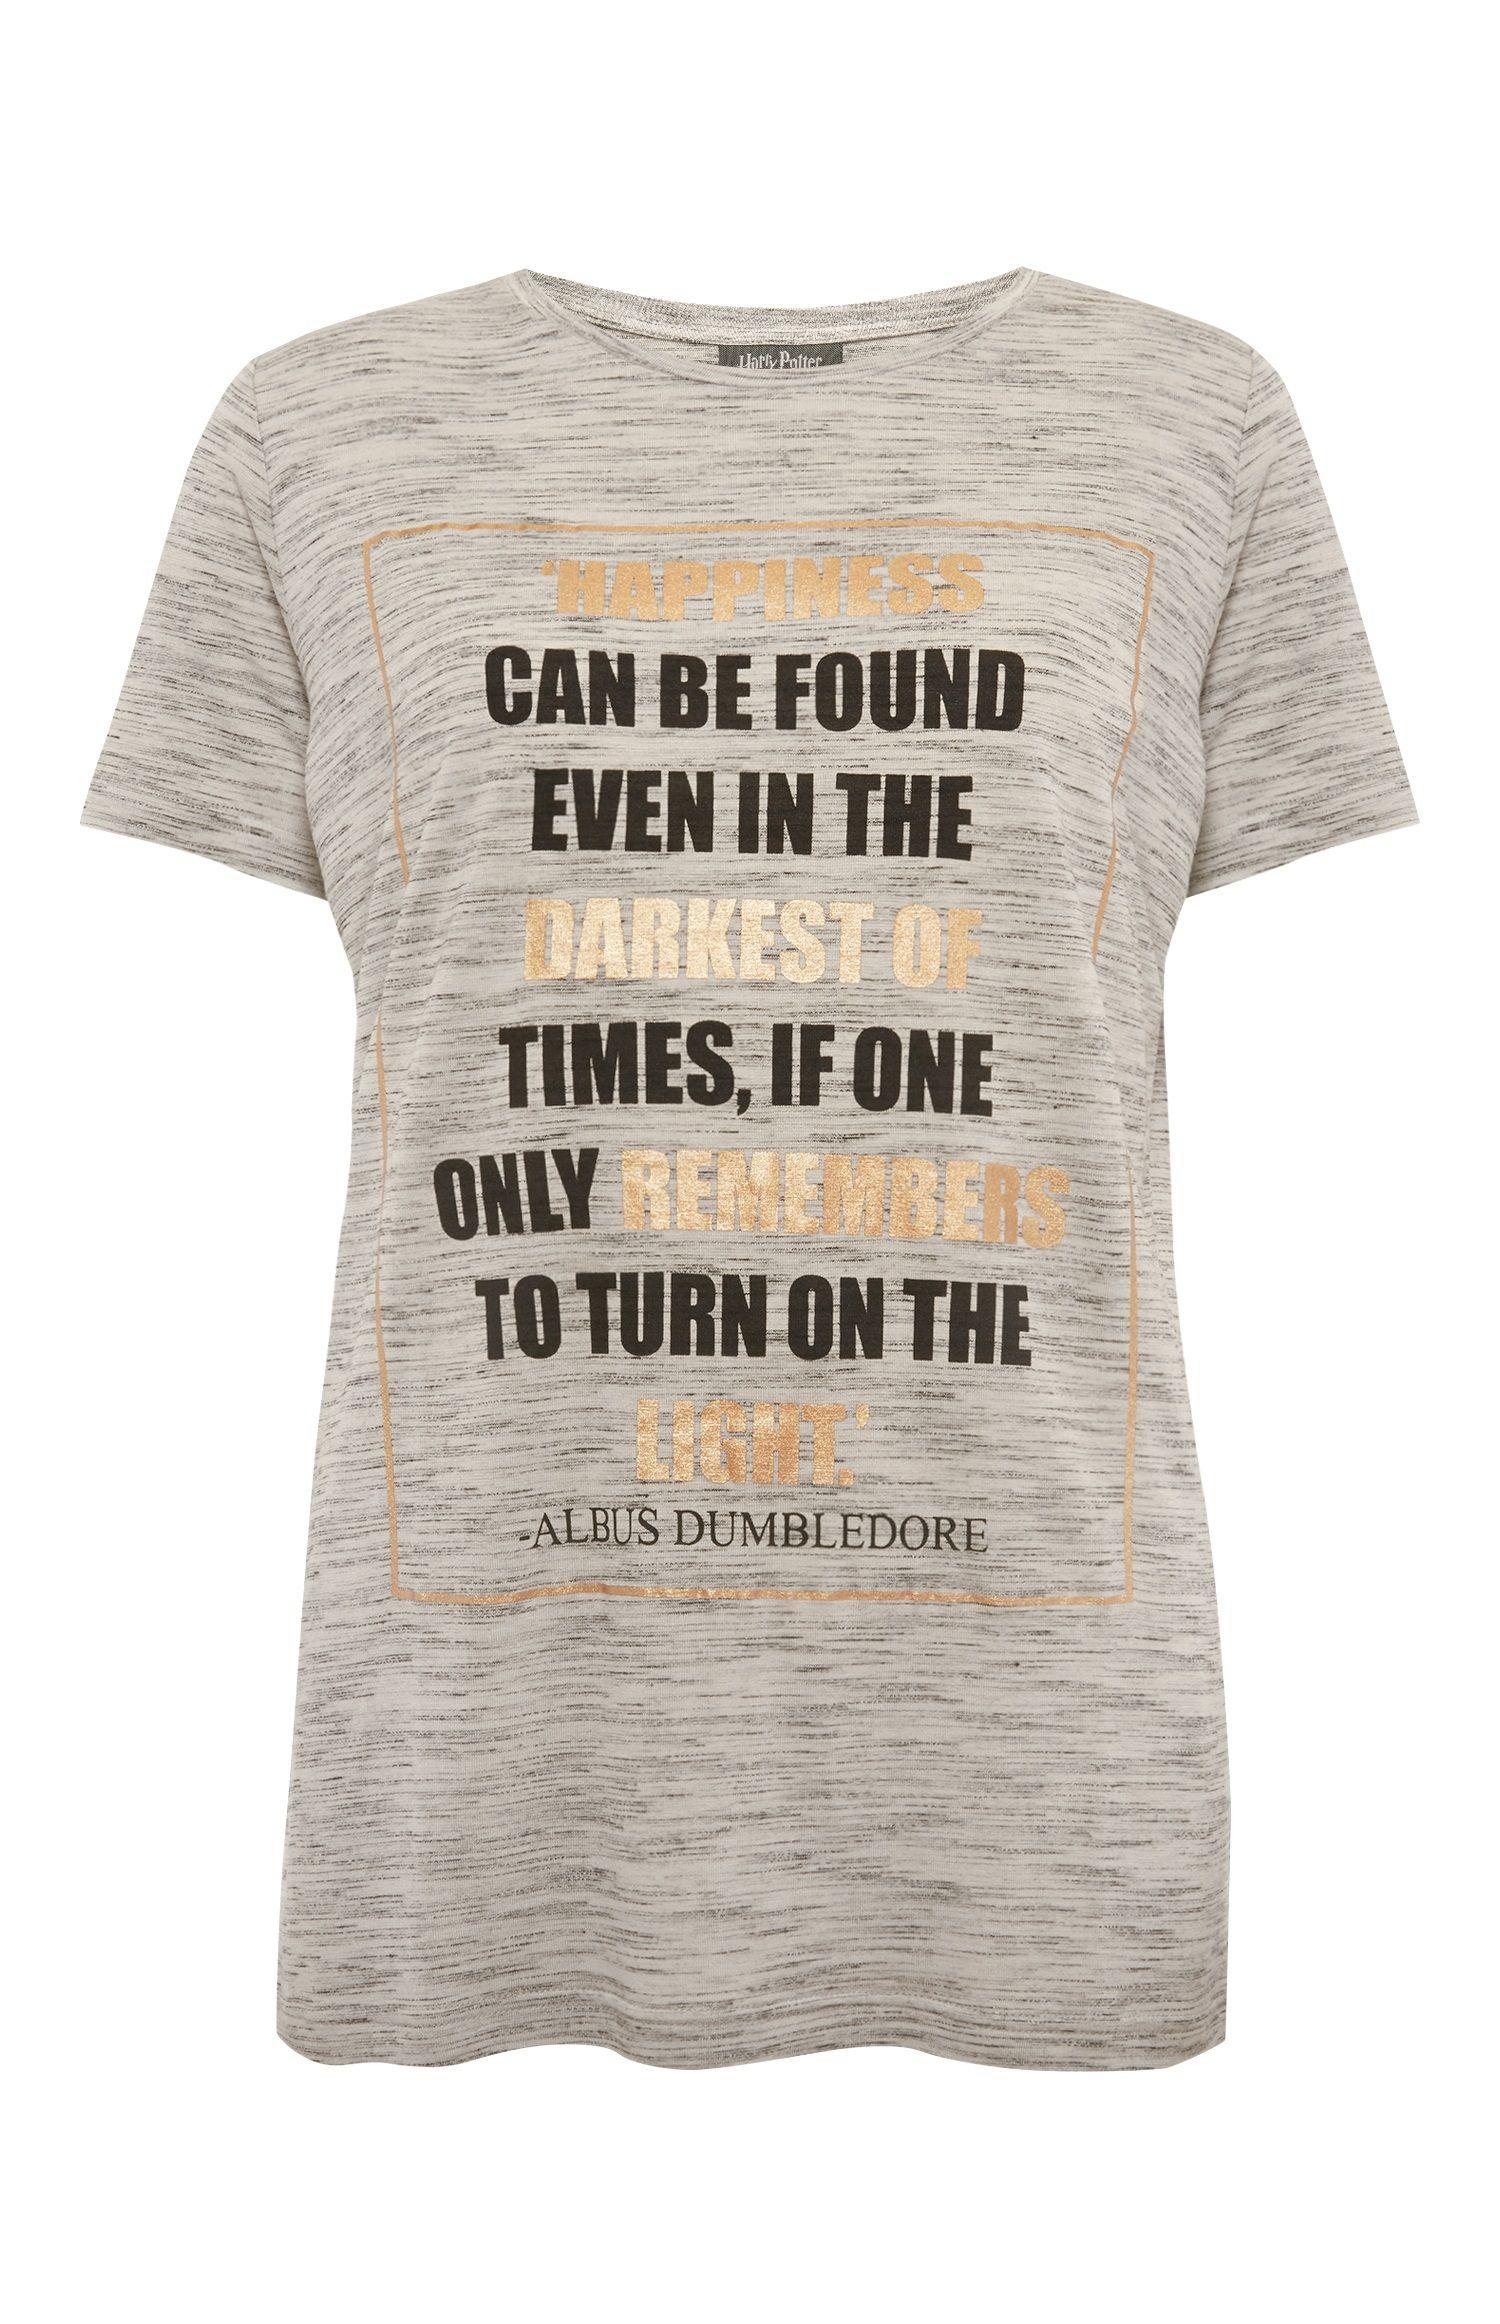 403e261cd Primark - Harry Potter Dumbledore Quote T-Shirt | my style | Primark ...